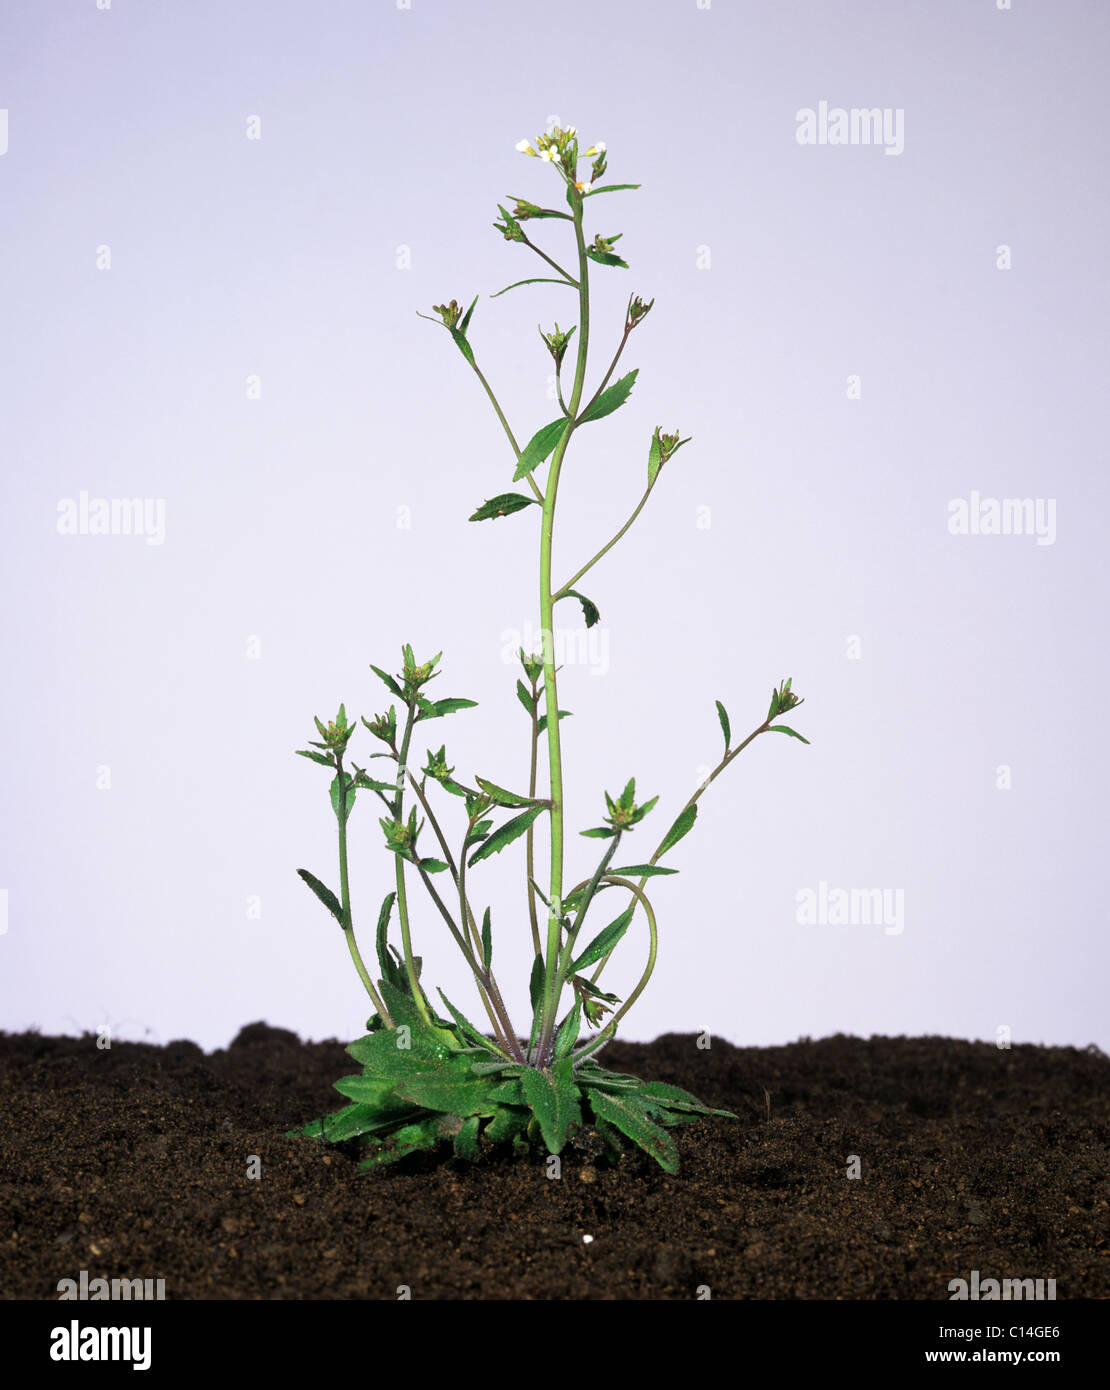 Thale Kresse (Arabidopsis Thaliana) blühende Pflanze Stockbild